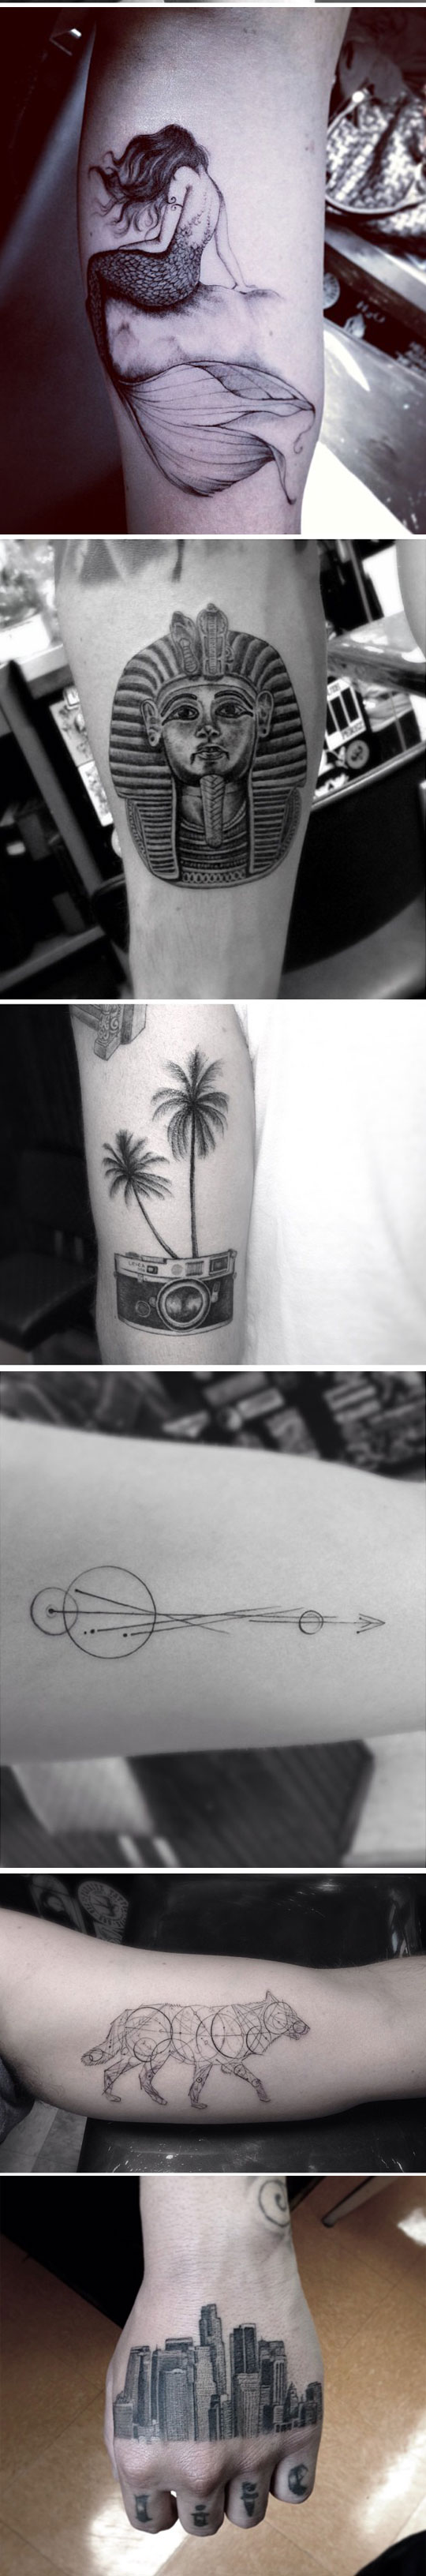 cool-tattoo-design-realistic-artist-needle-wolf